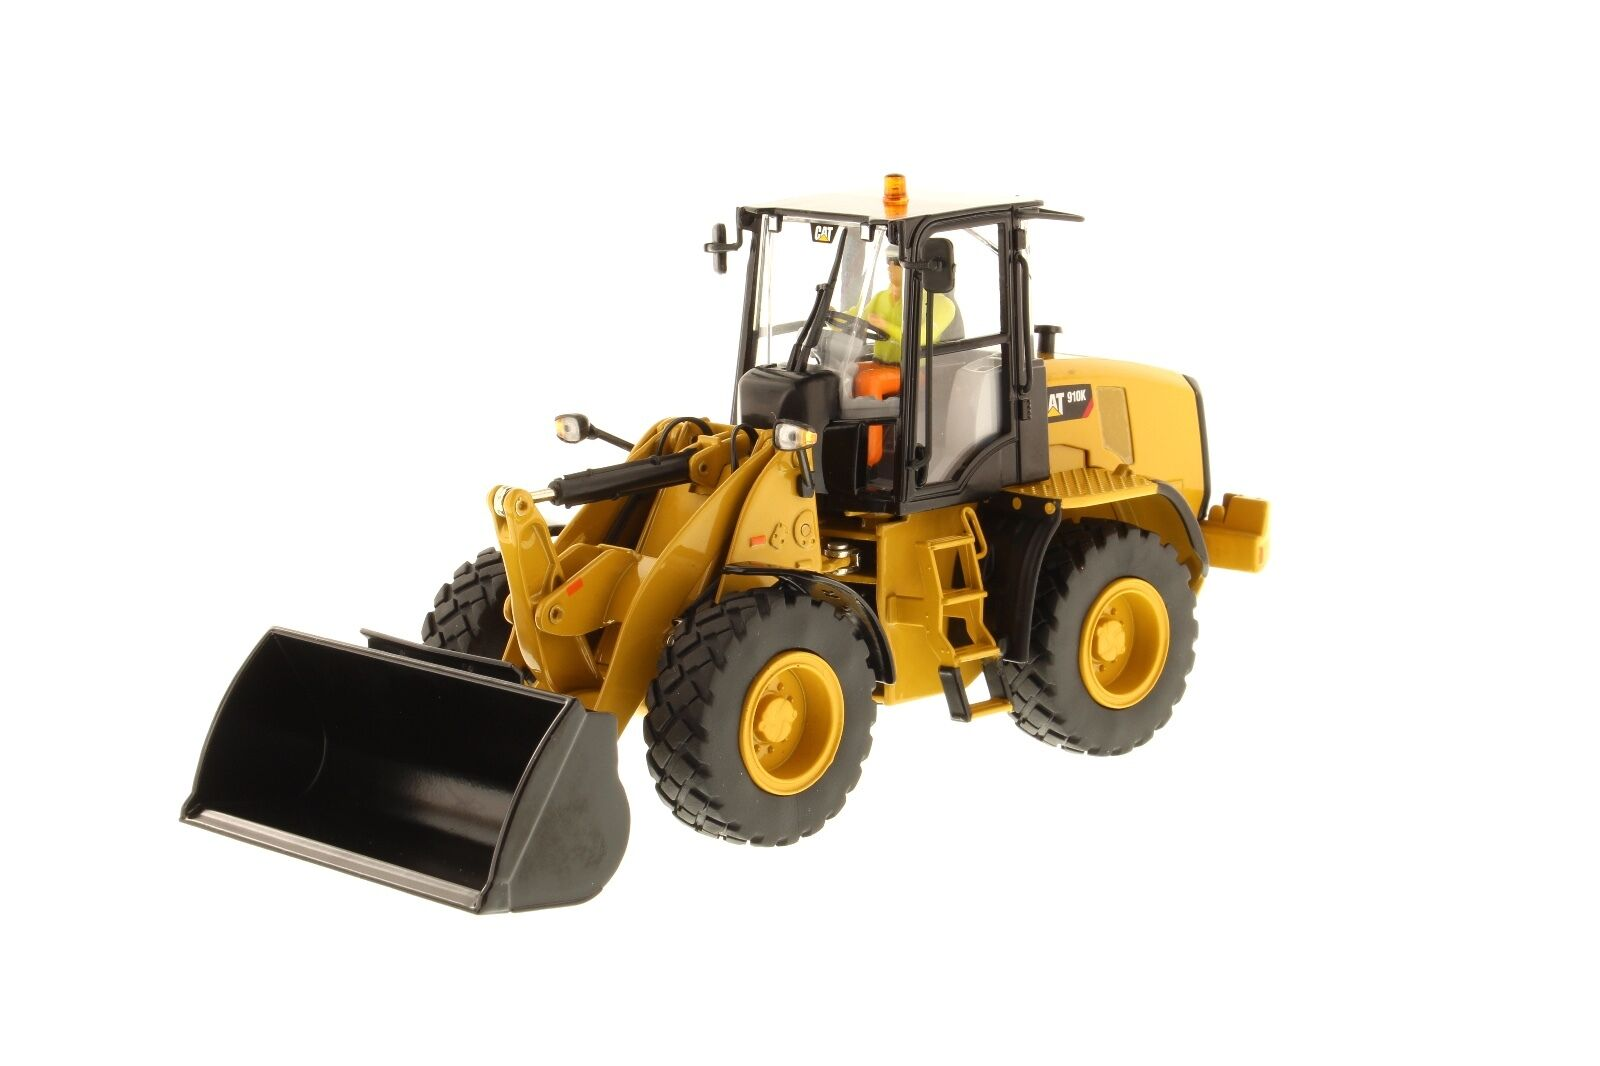 Caterpillar® 1 32 scale Cat 910K Wheel Loader - Diecast Masters 85294